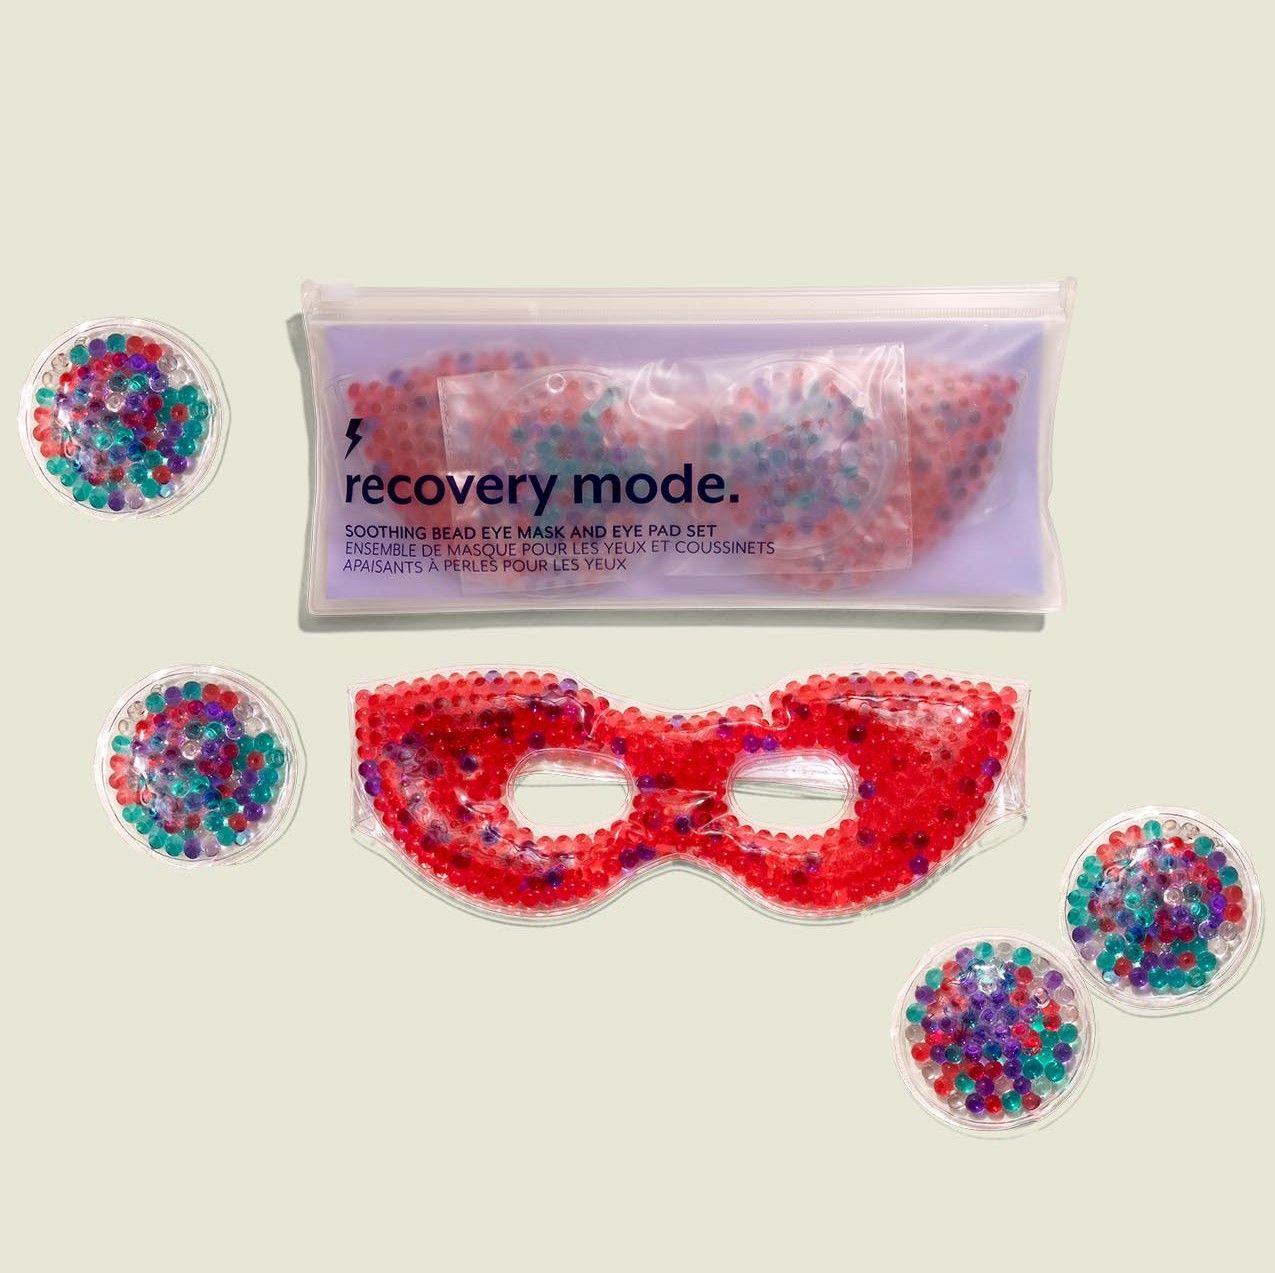 Custom packaging with bead eye mask and bead eye pads